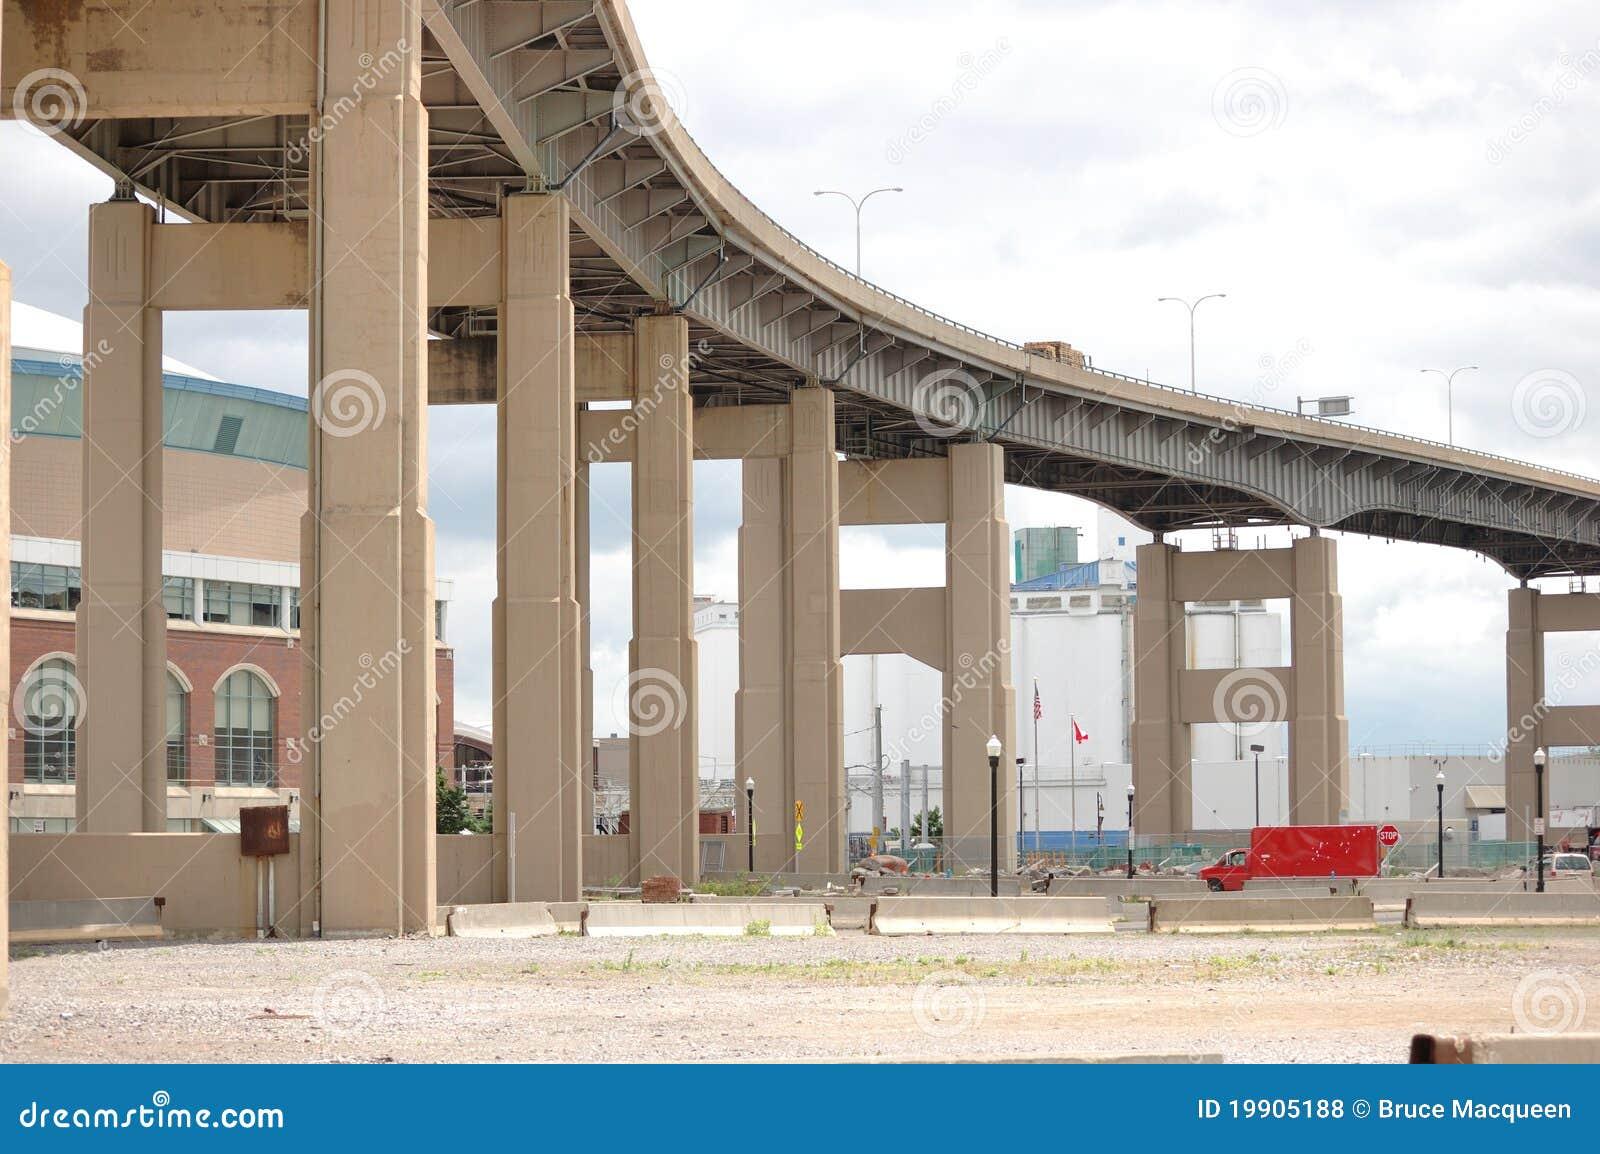 Buffalo Skyway